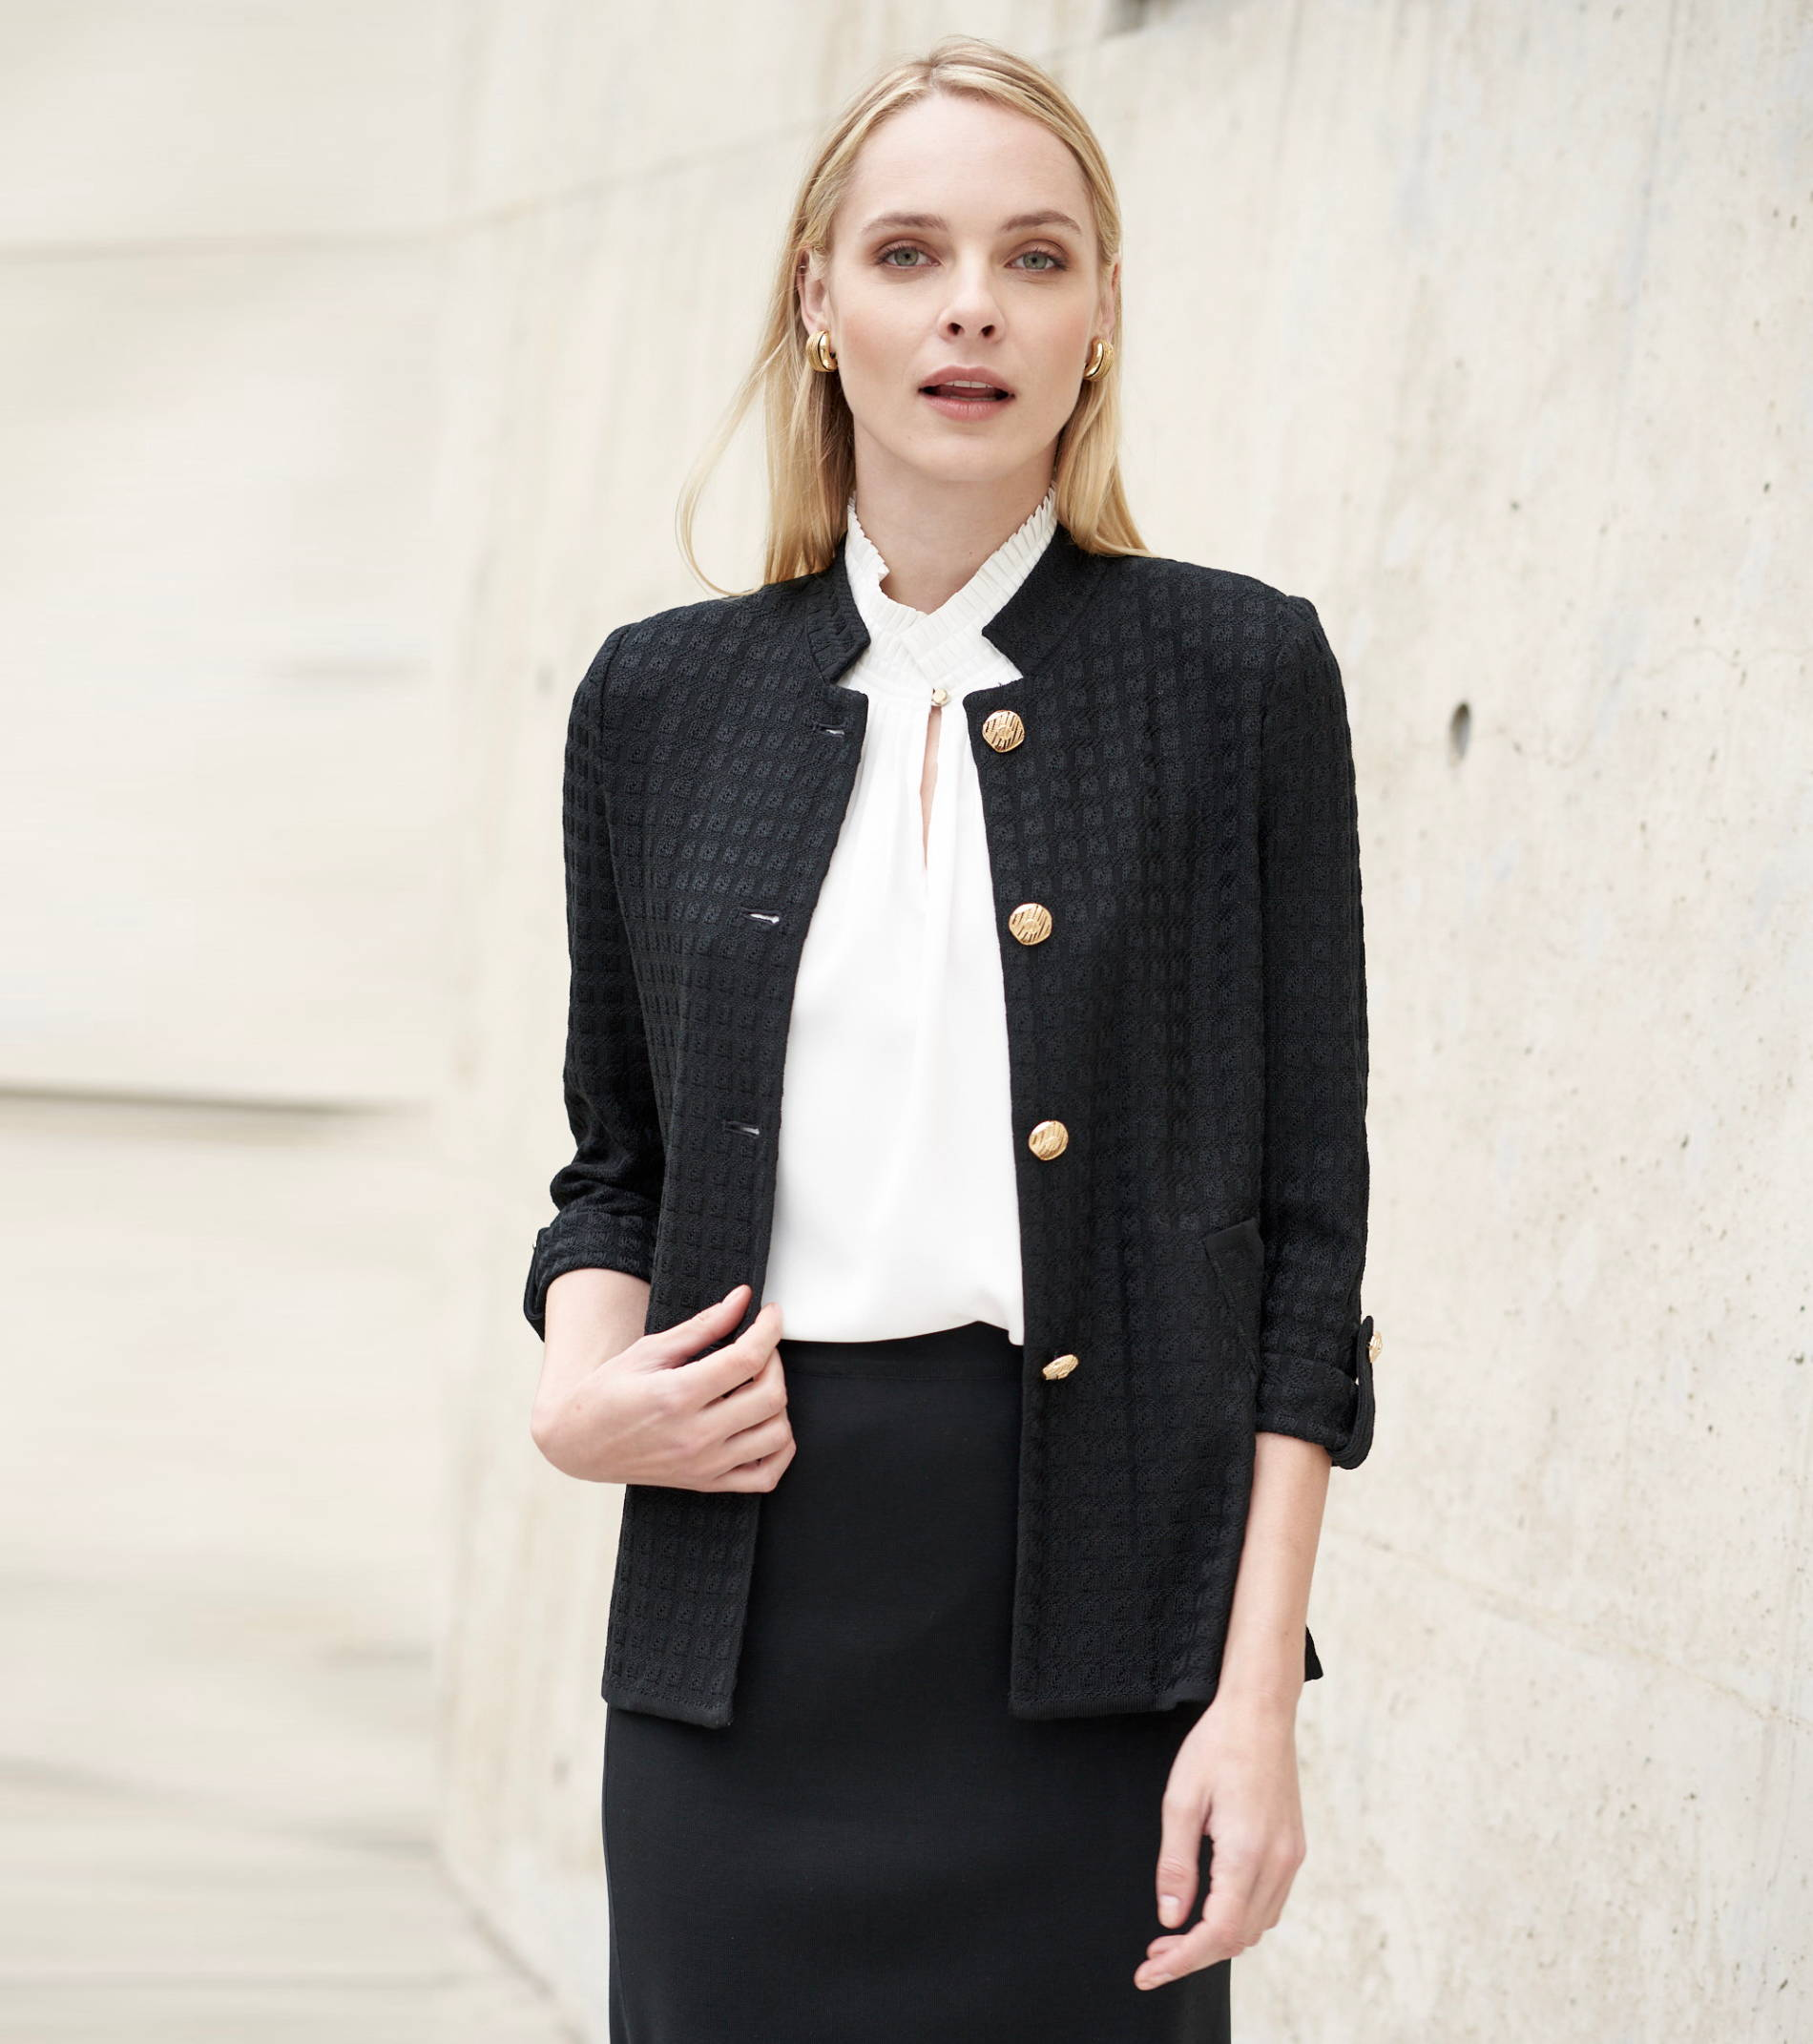 Online Exclusive! Mandarin Textured Knit Jacket in Black   Ming Wang